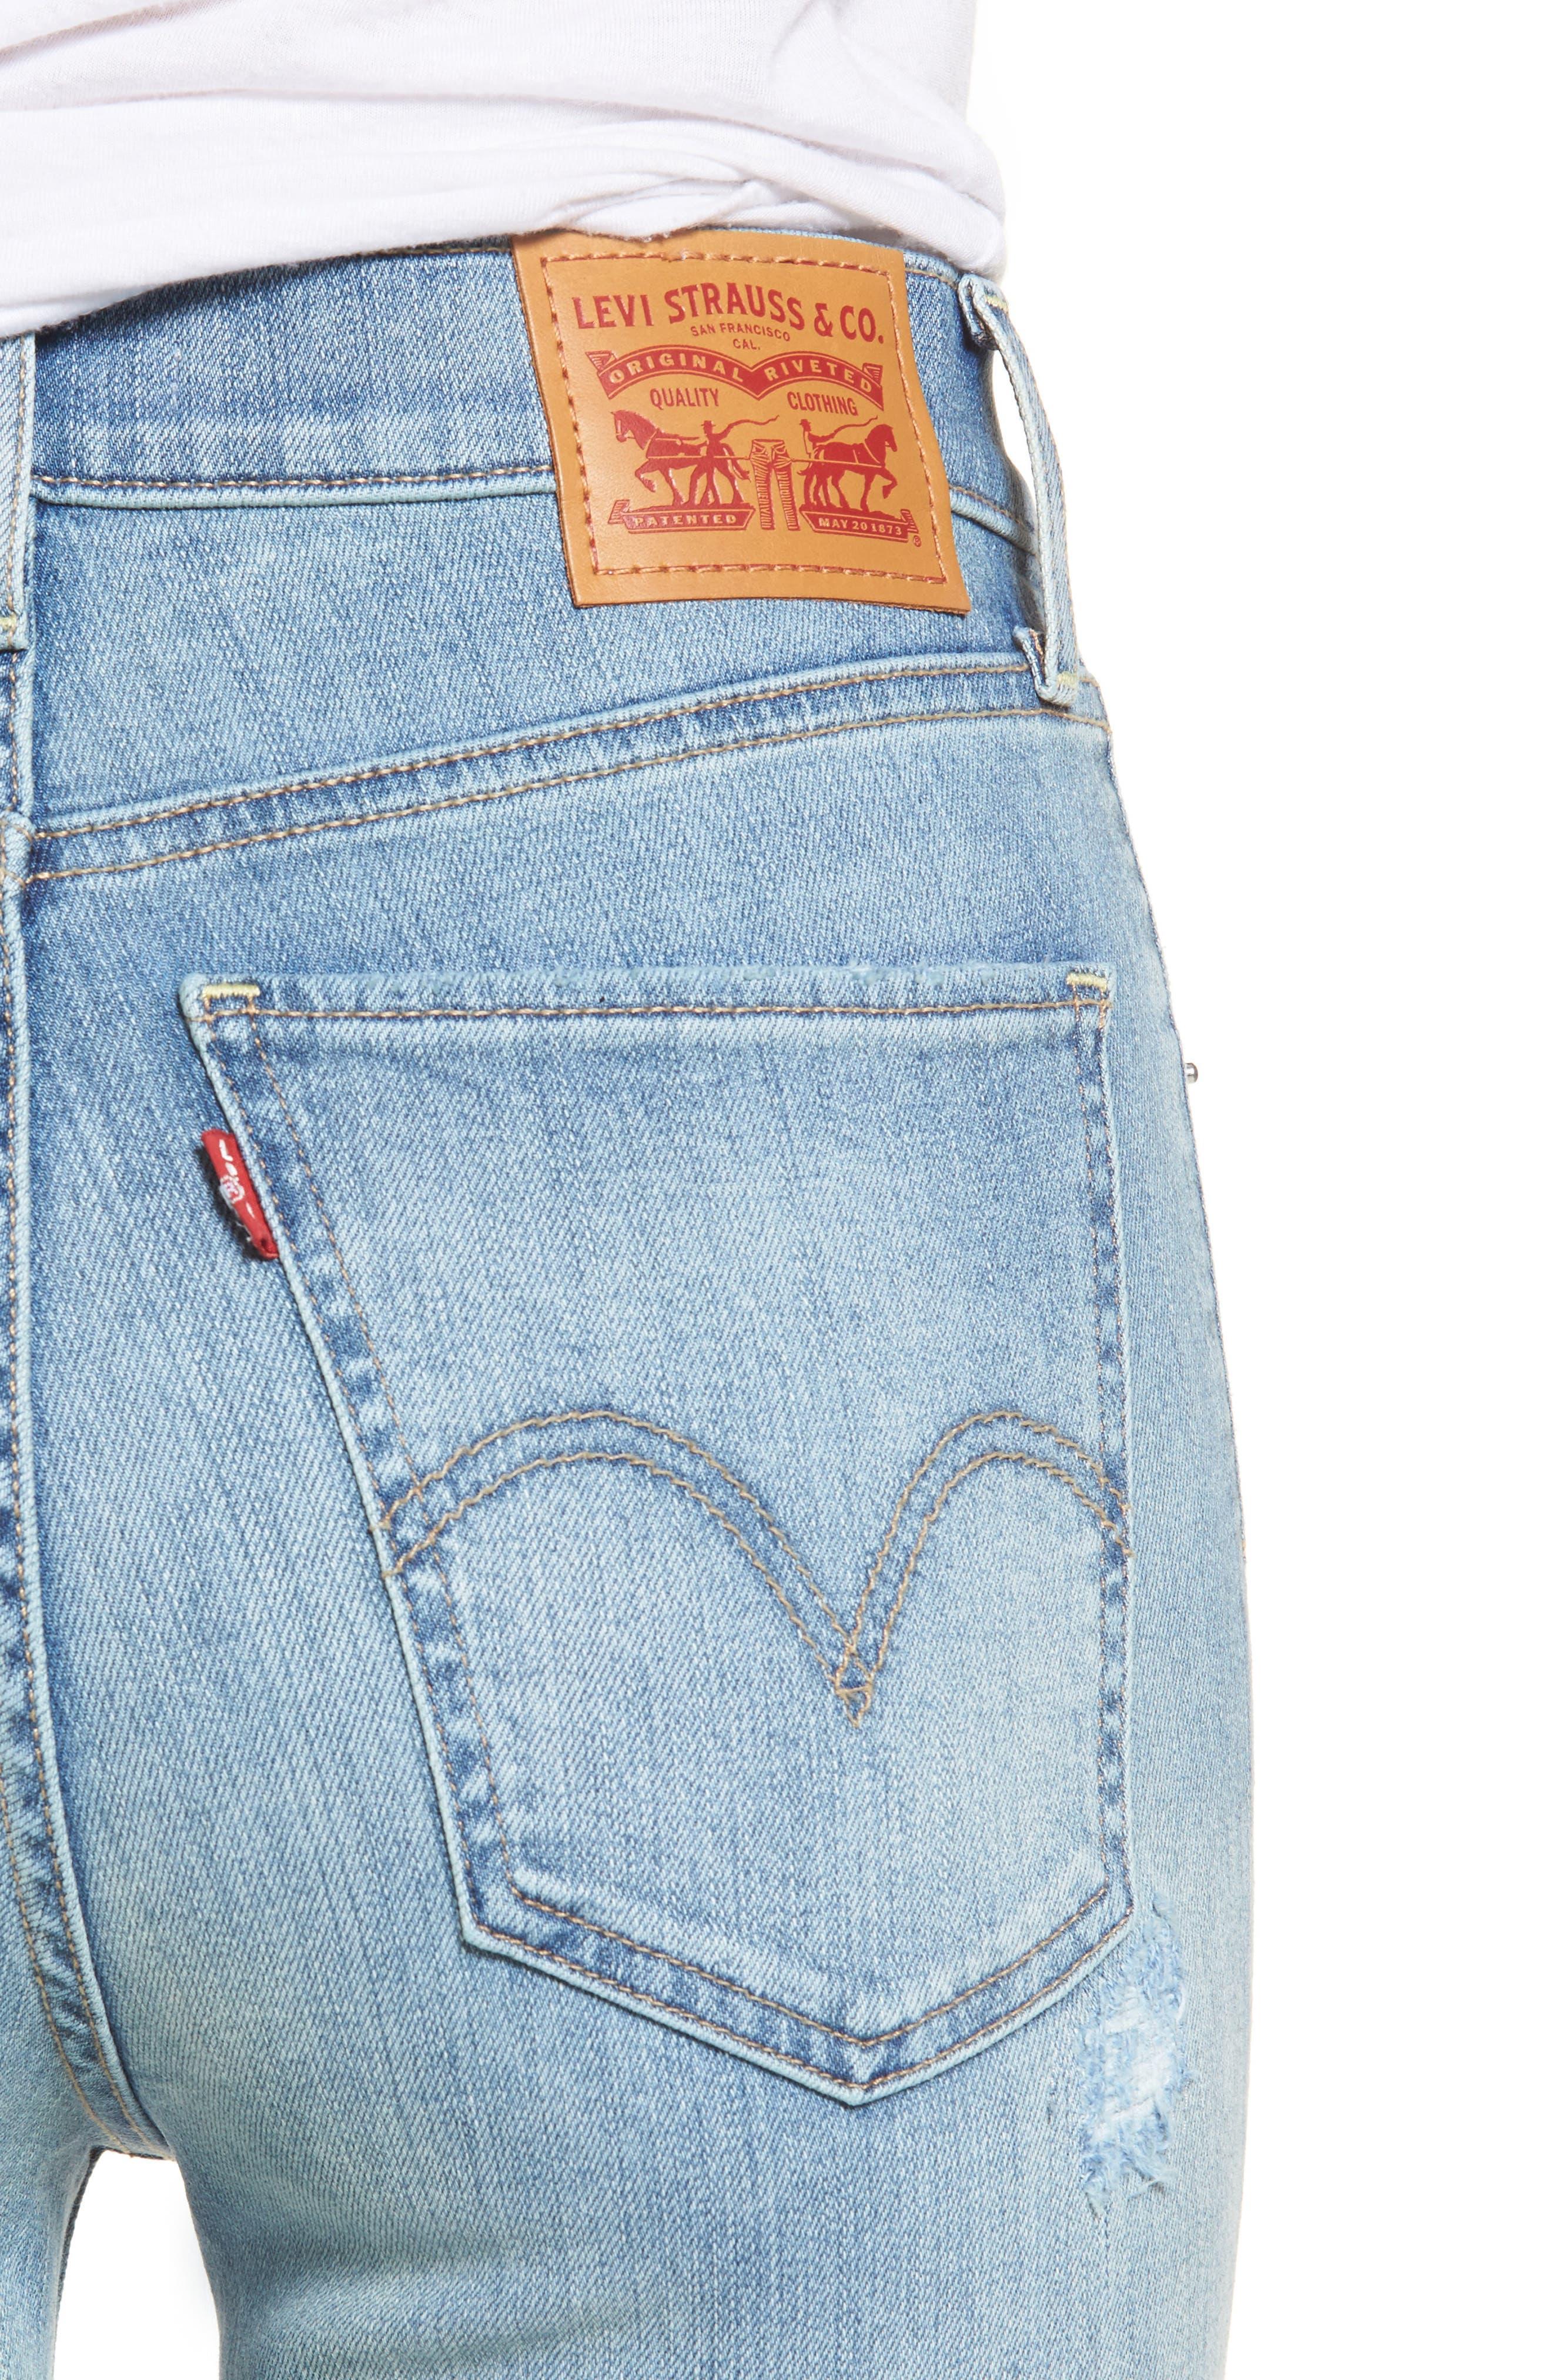 Mile High Super Skinny Jeans,                             Alternate thumbnail 4, color,                             Prime Time